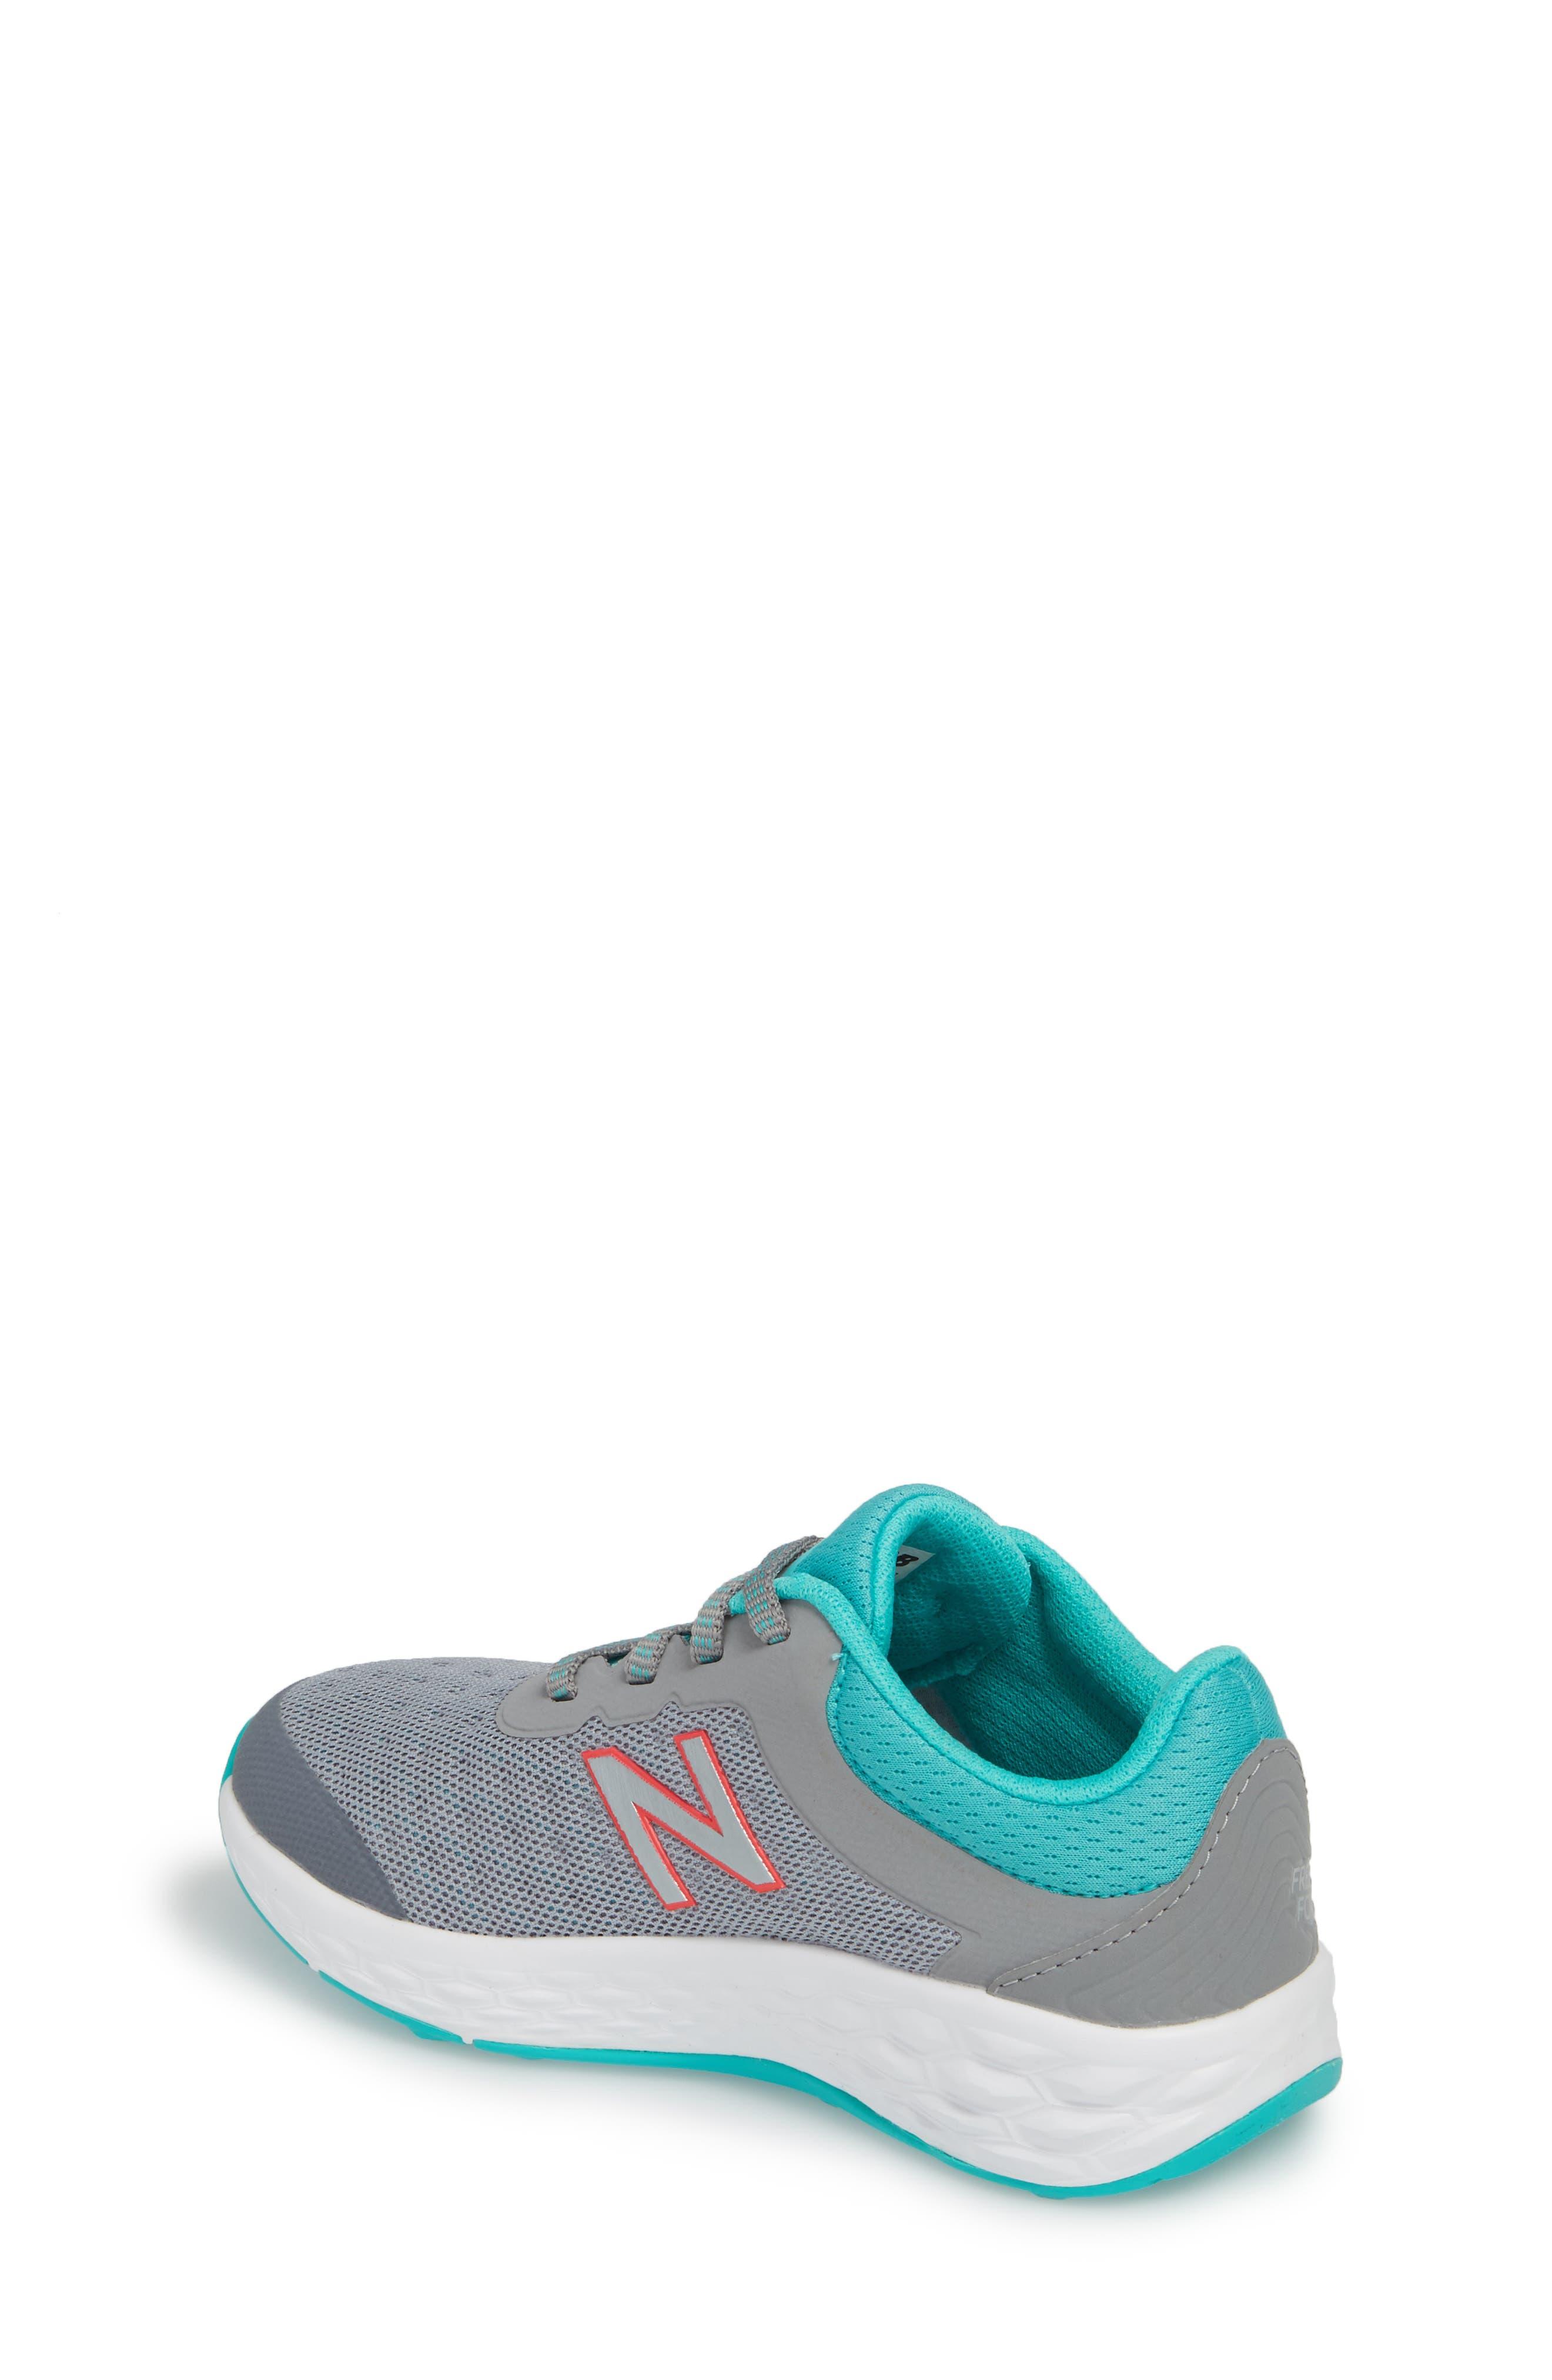 Fresh Foam Kaymin Sneaker,                             Alternate thumbnail 2, color,                             071